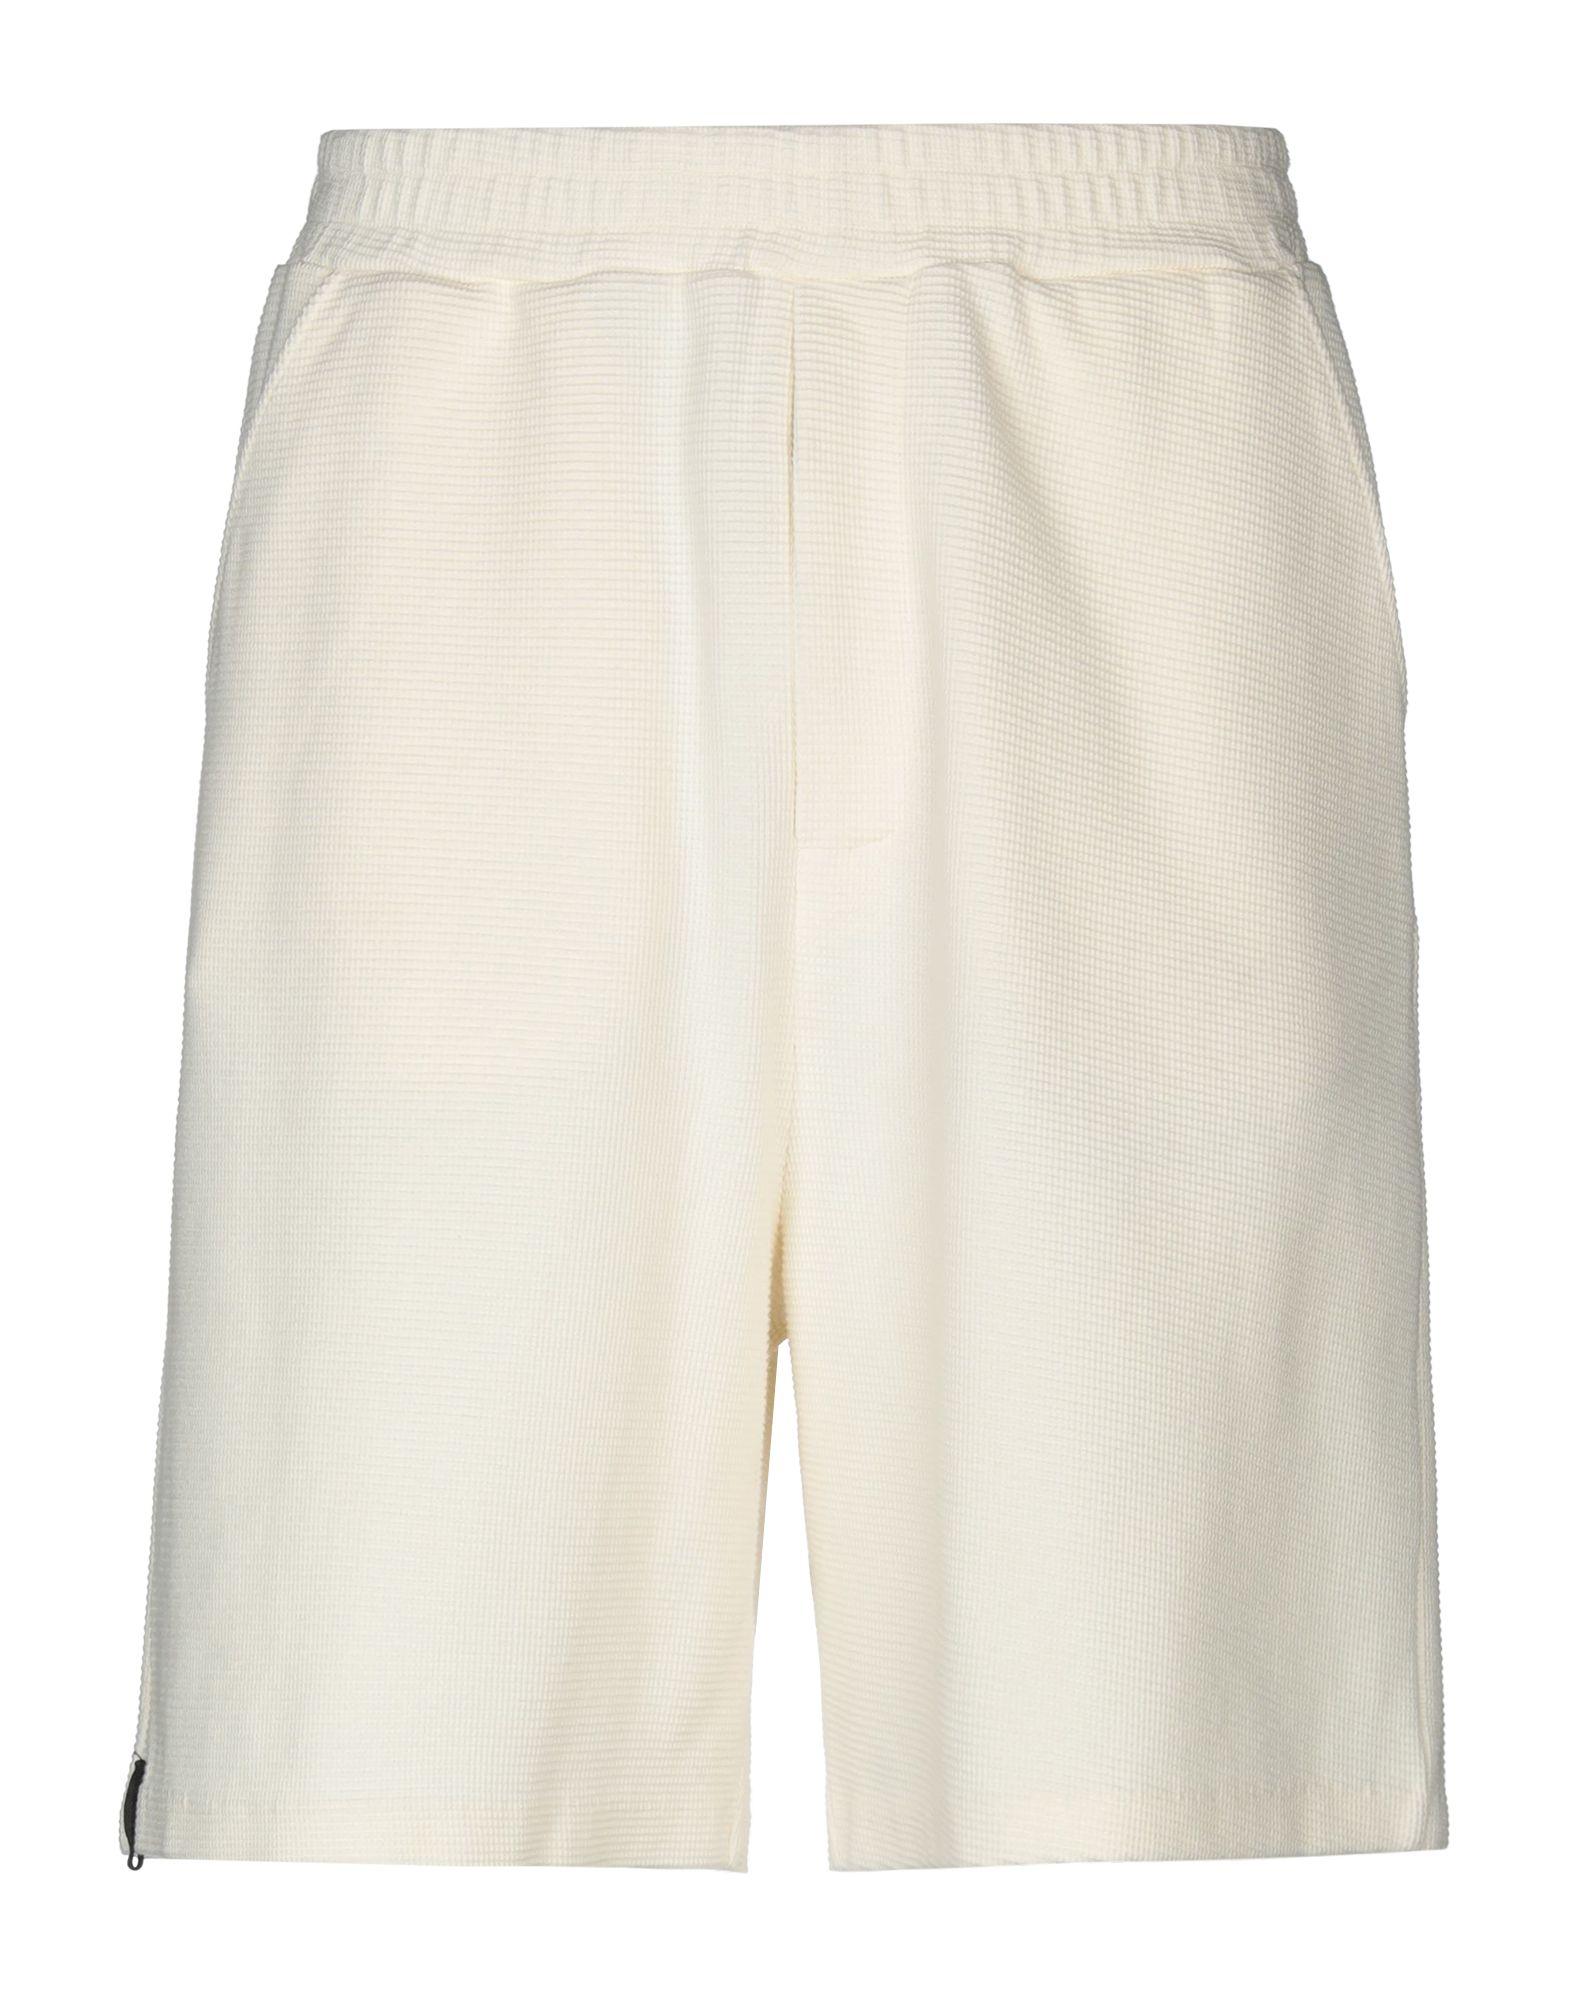 AMH ASHLEY MARC HOVELLE Бермуды ashley brooke моделирующие брюки